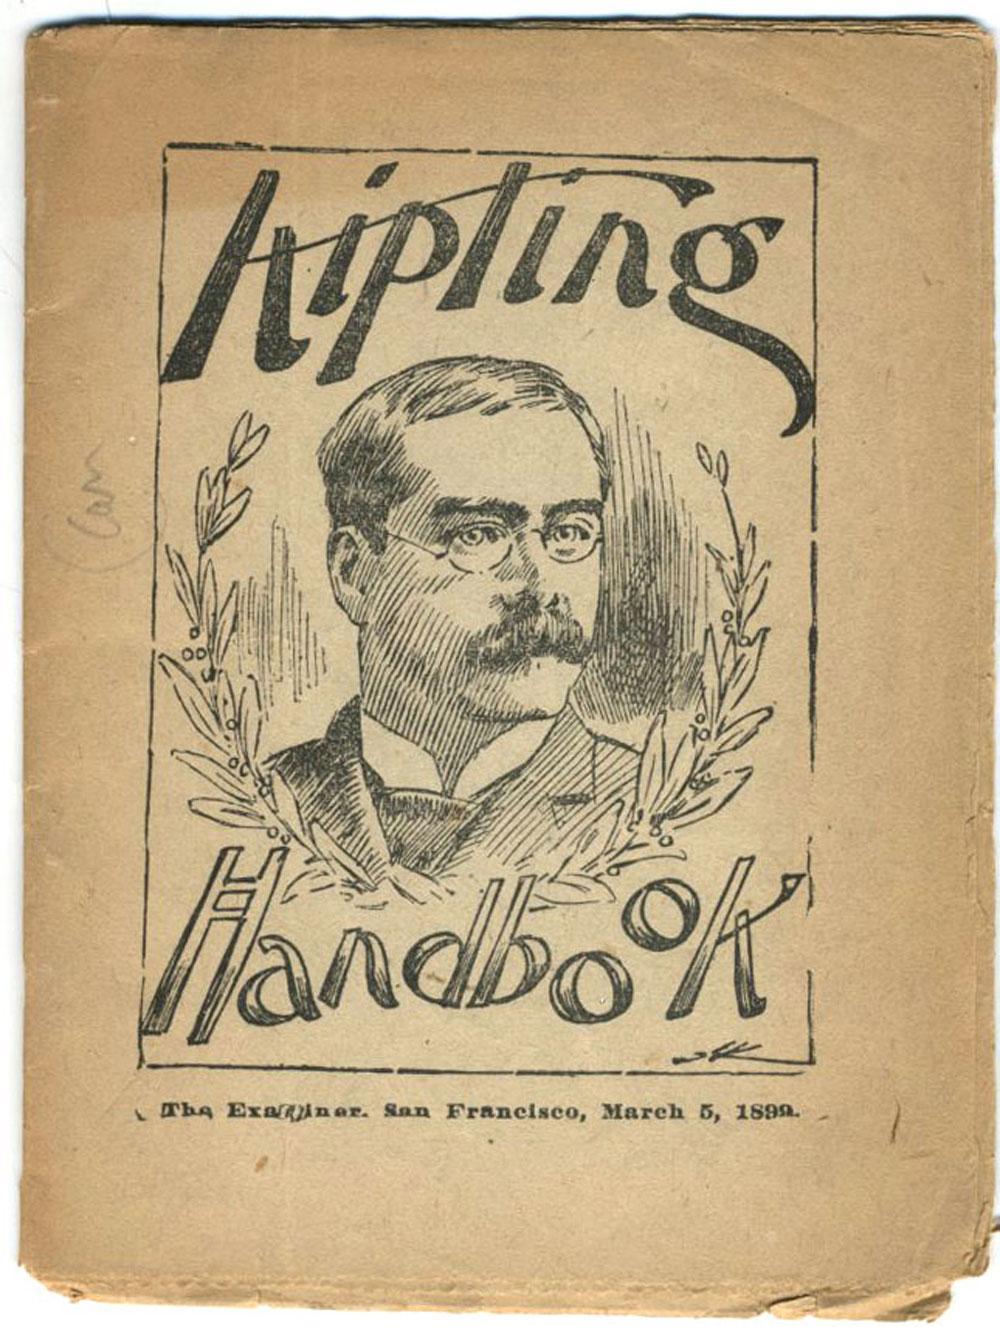 Kipling Handbook Kipling, Rudyard [ ] (bi_21912039728) photo